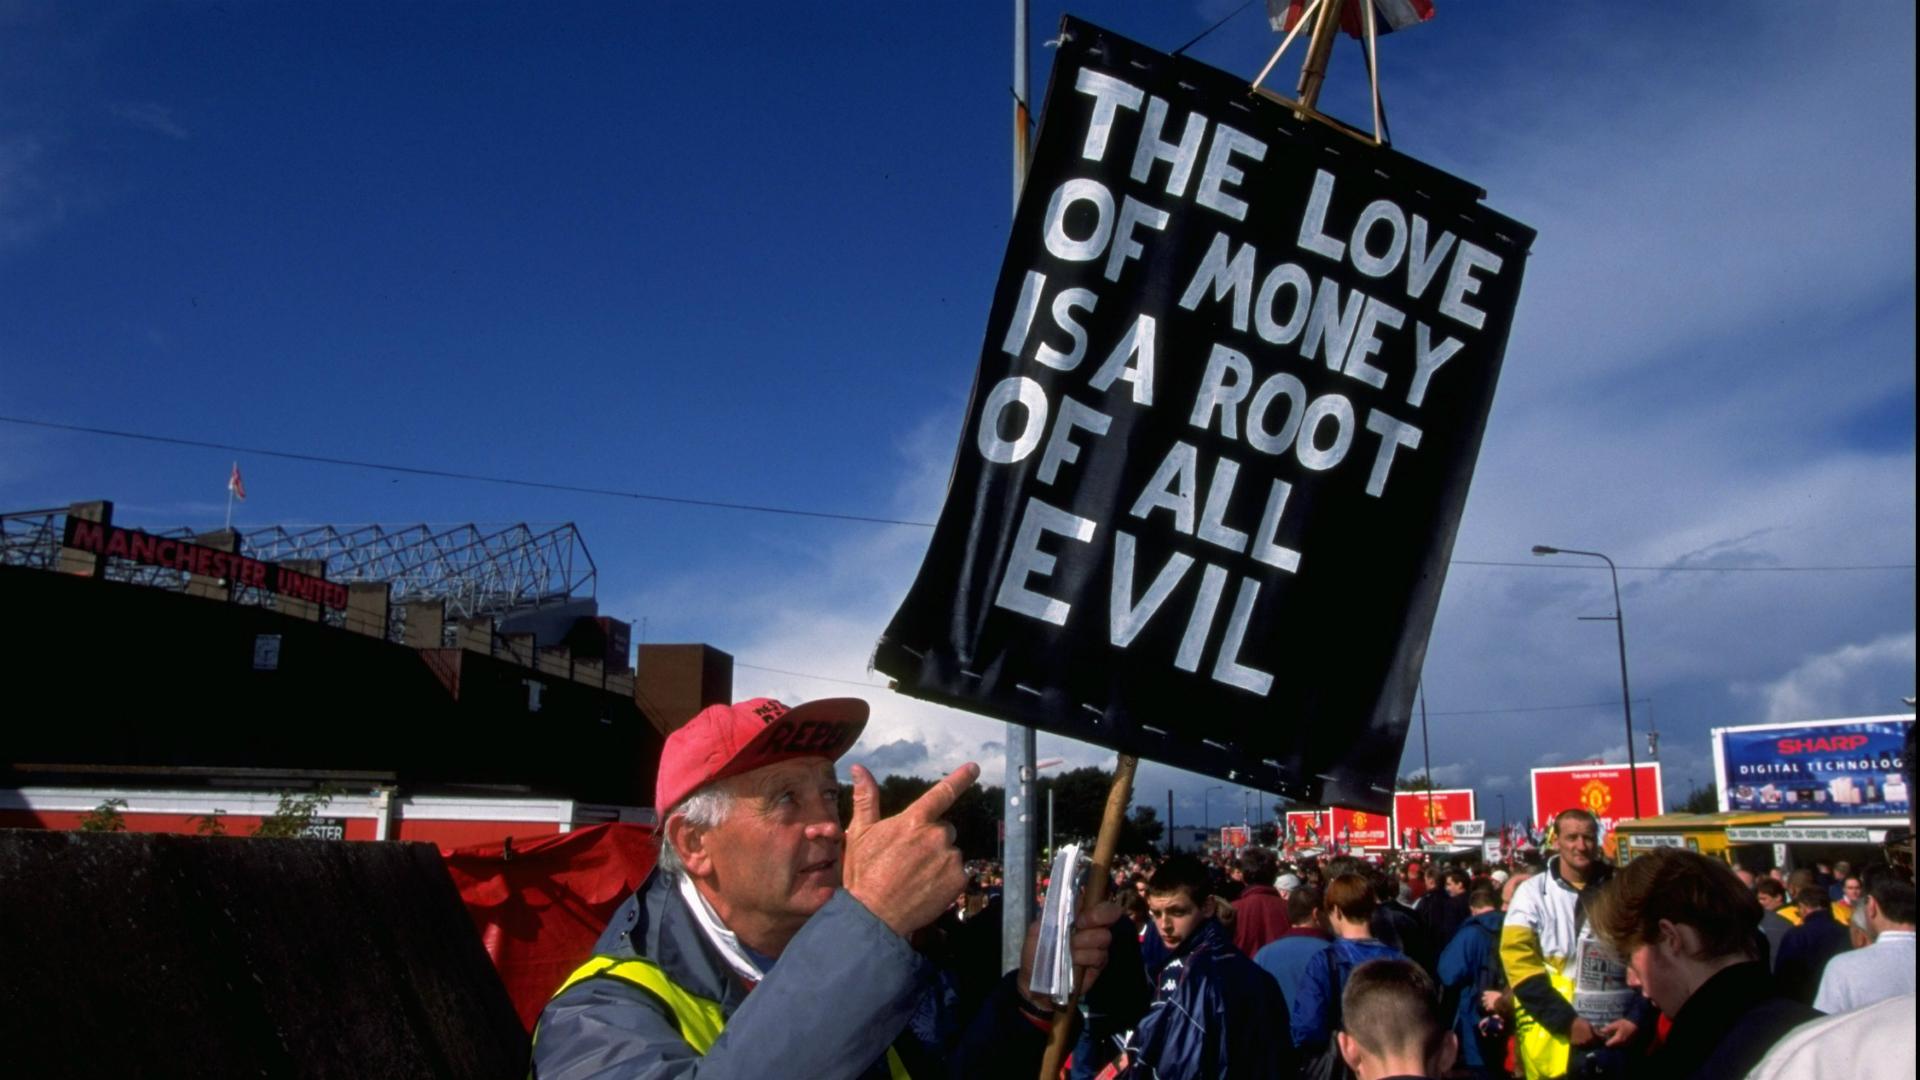 Manchester United Rupert Murdoch protest